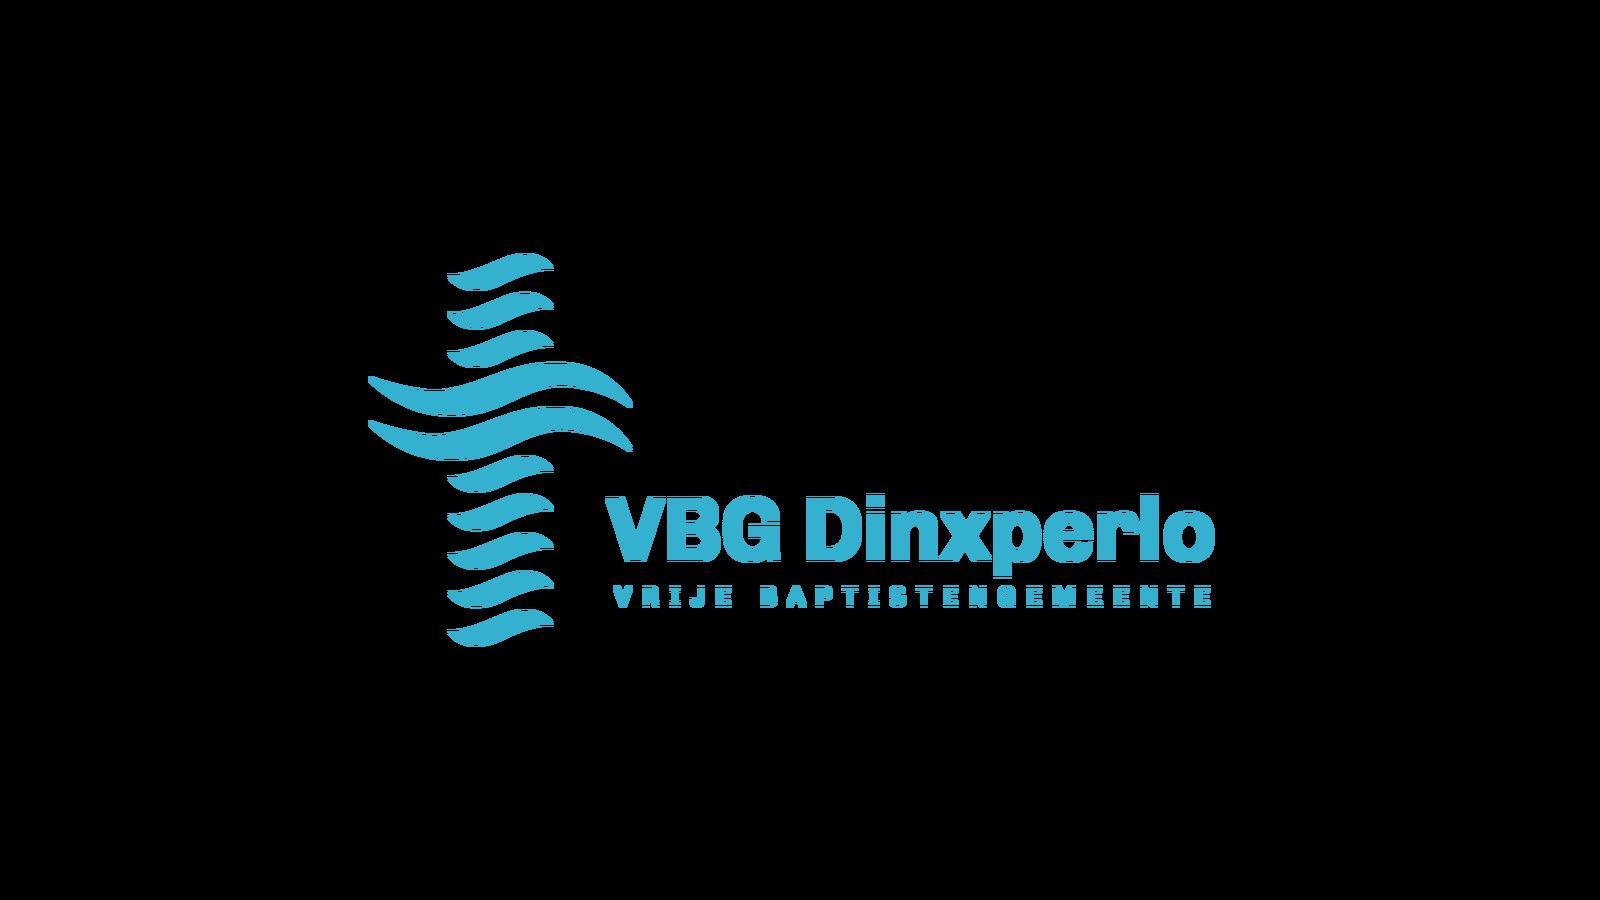 Vrije Baptistengemeente Dinxperlo